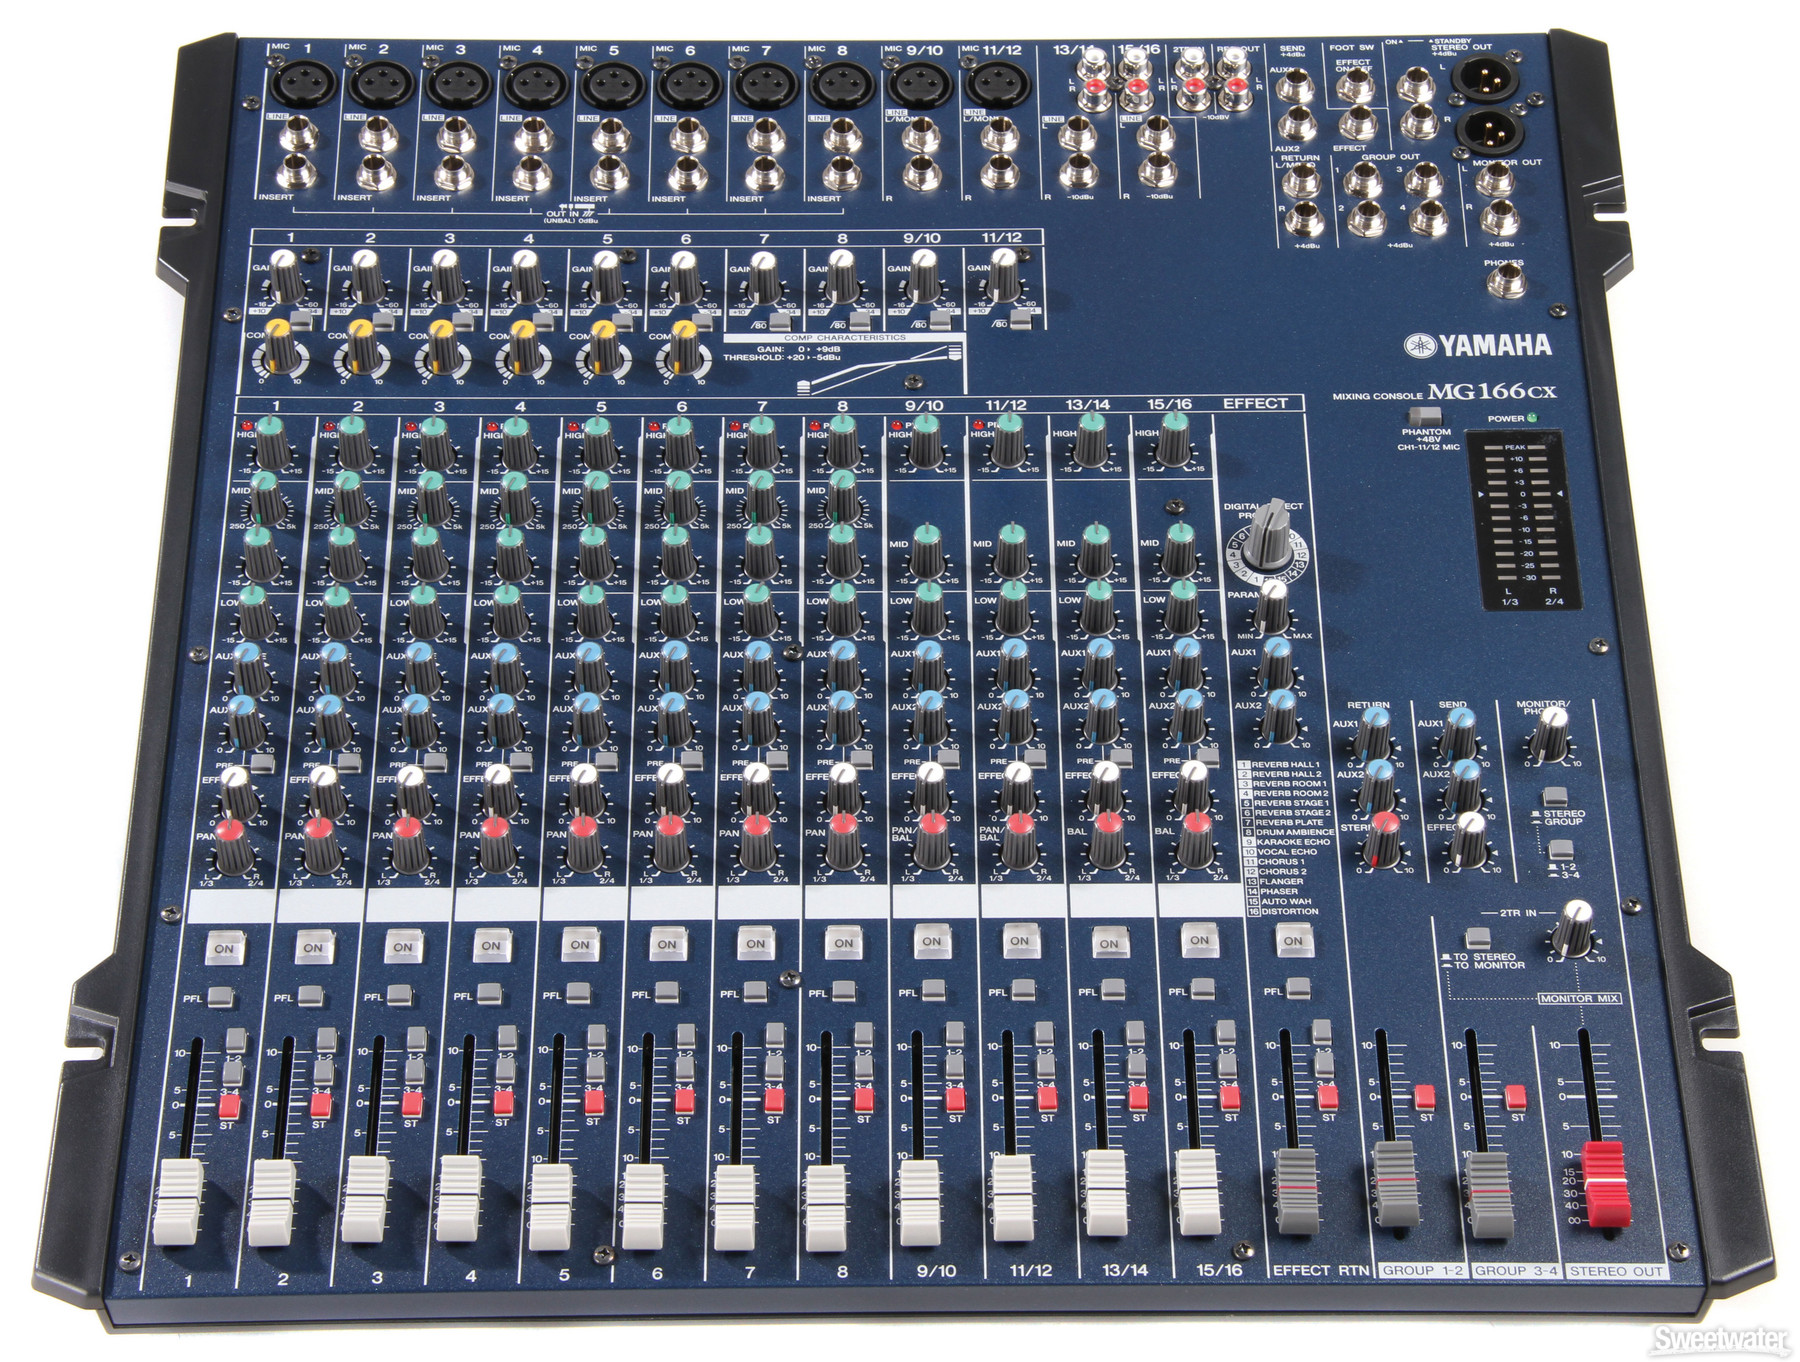 yamaha mg166cx image 691218 audiofanzine rh en audiofanzine com yamaha mg166cx mixing console manual Yamaha Mg16